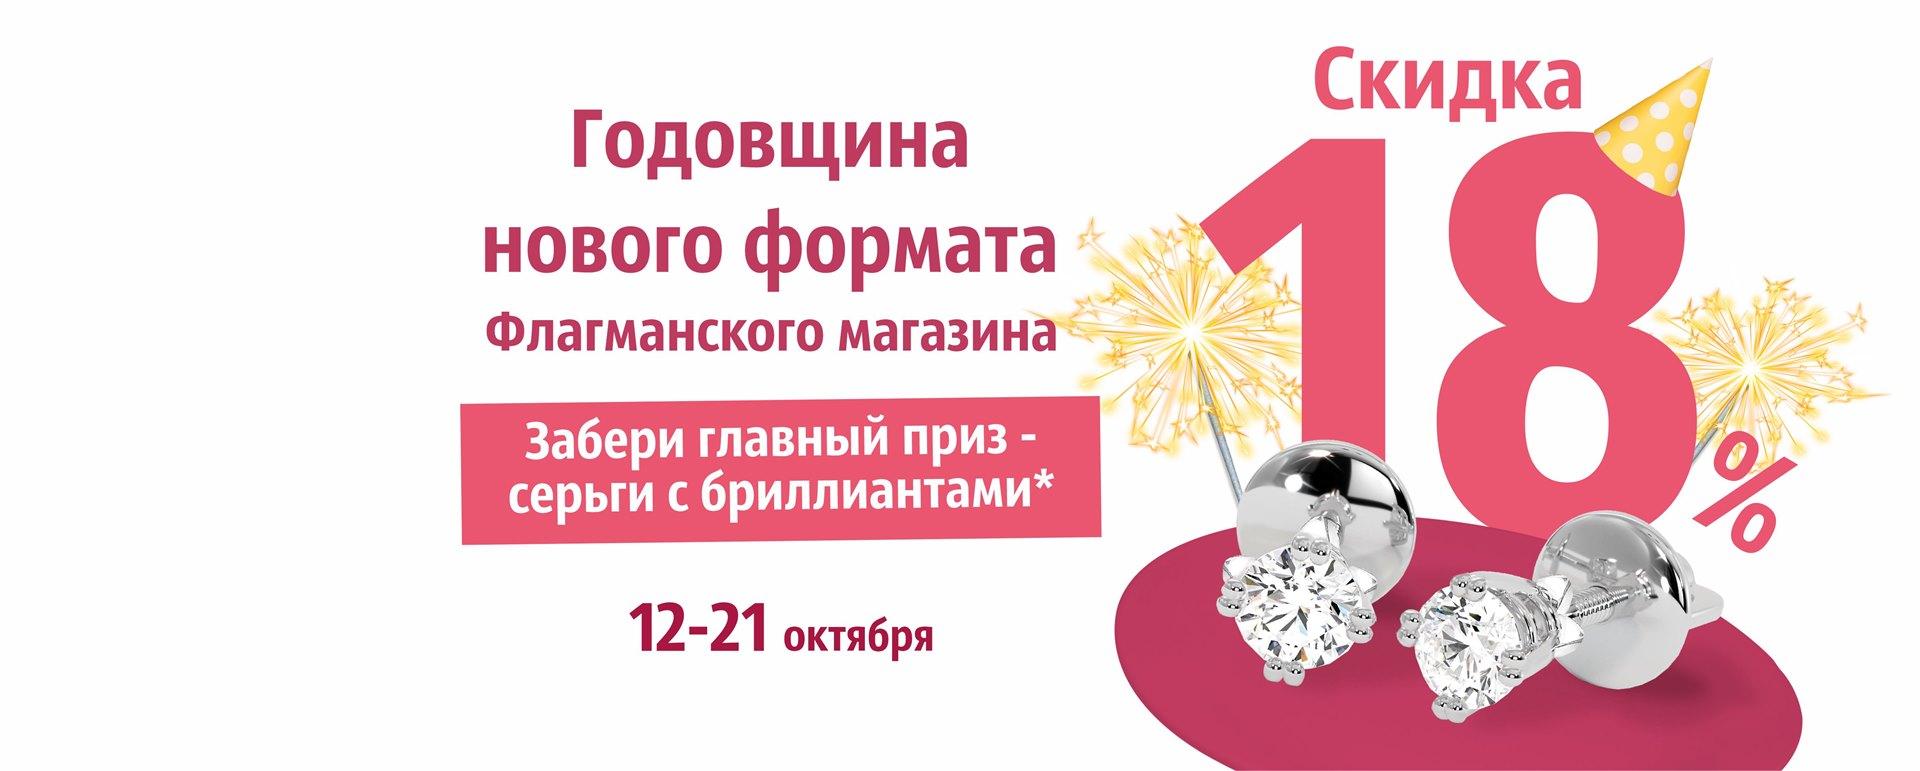 https://www.almazcom.ru/pub/img/Info/24/banner2_sajt_18_flagman.jpg